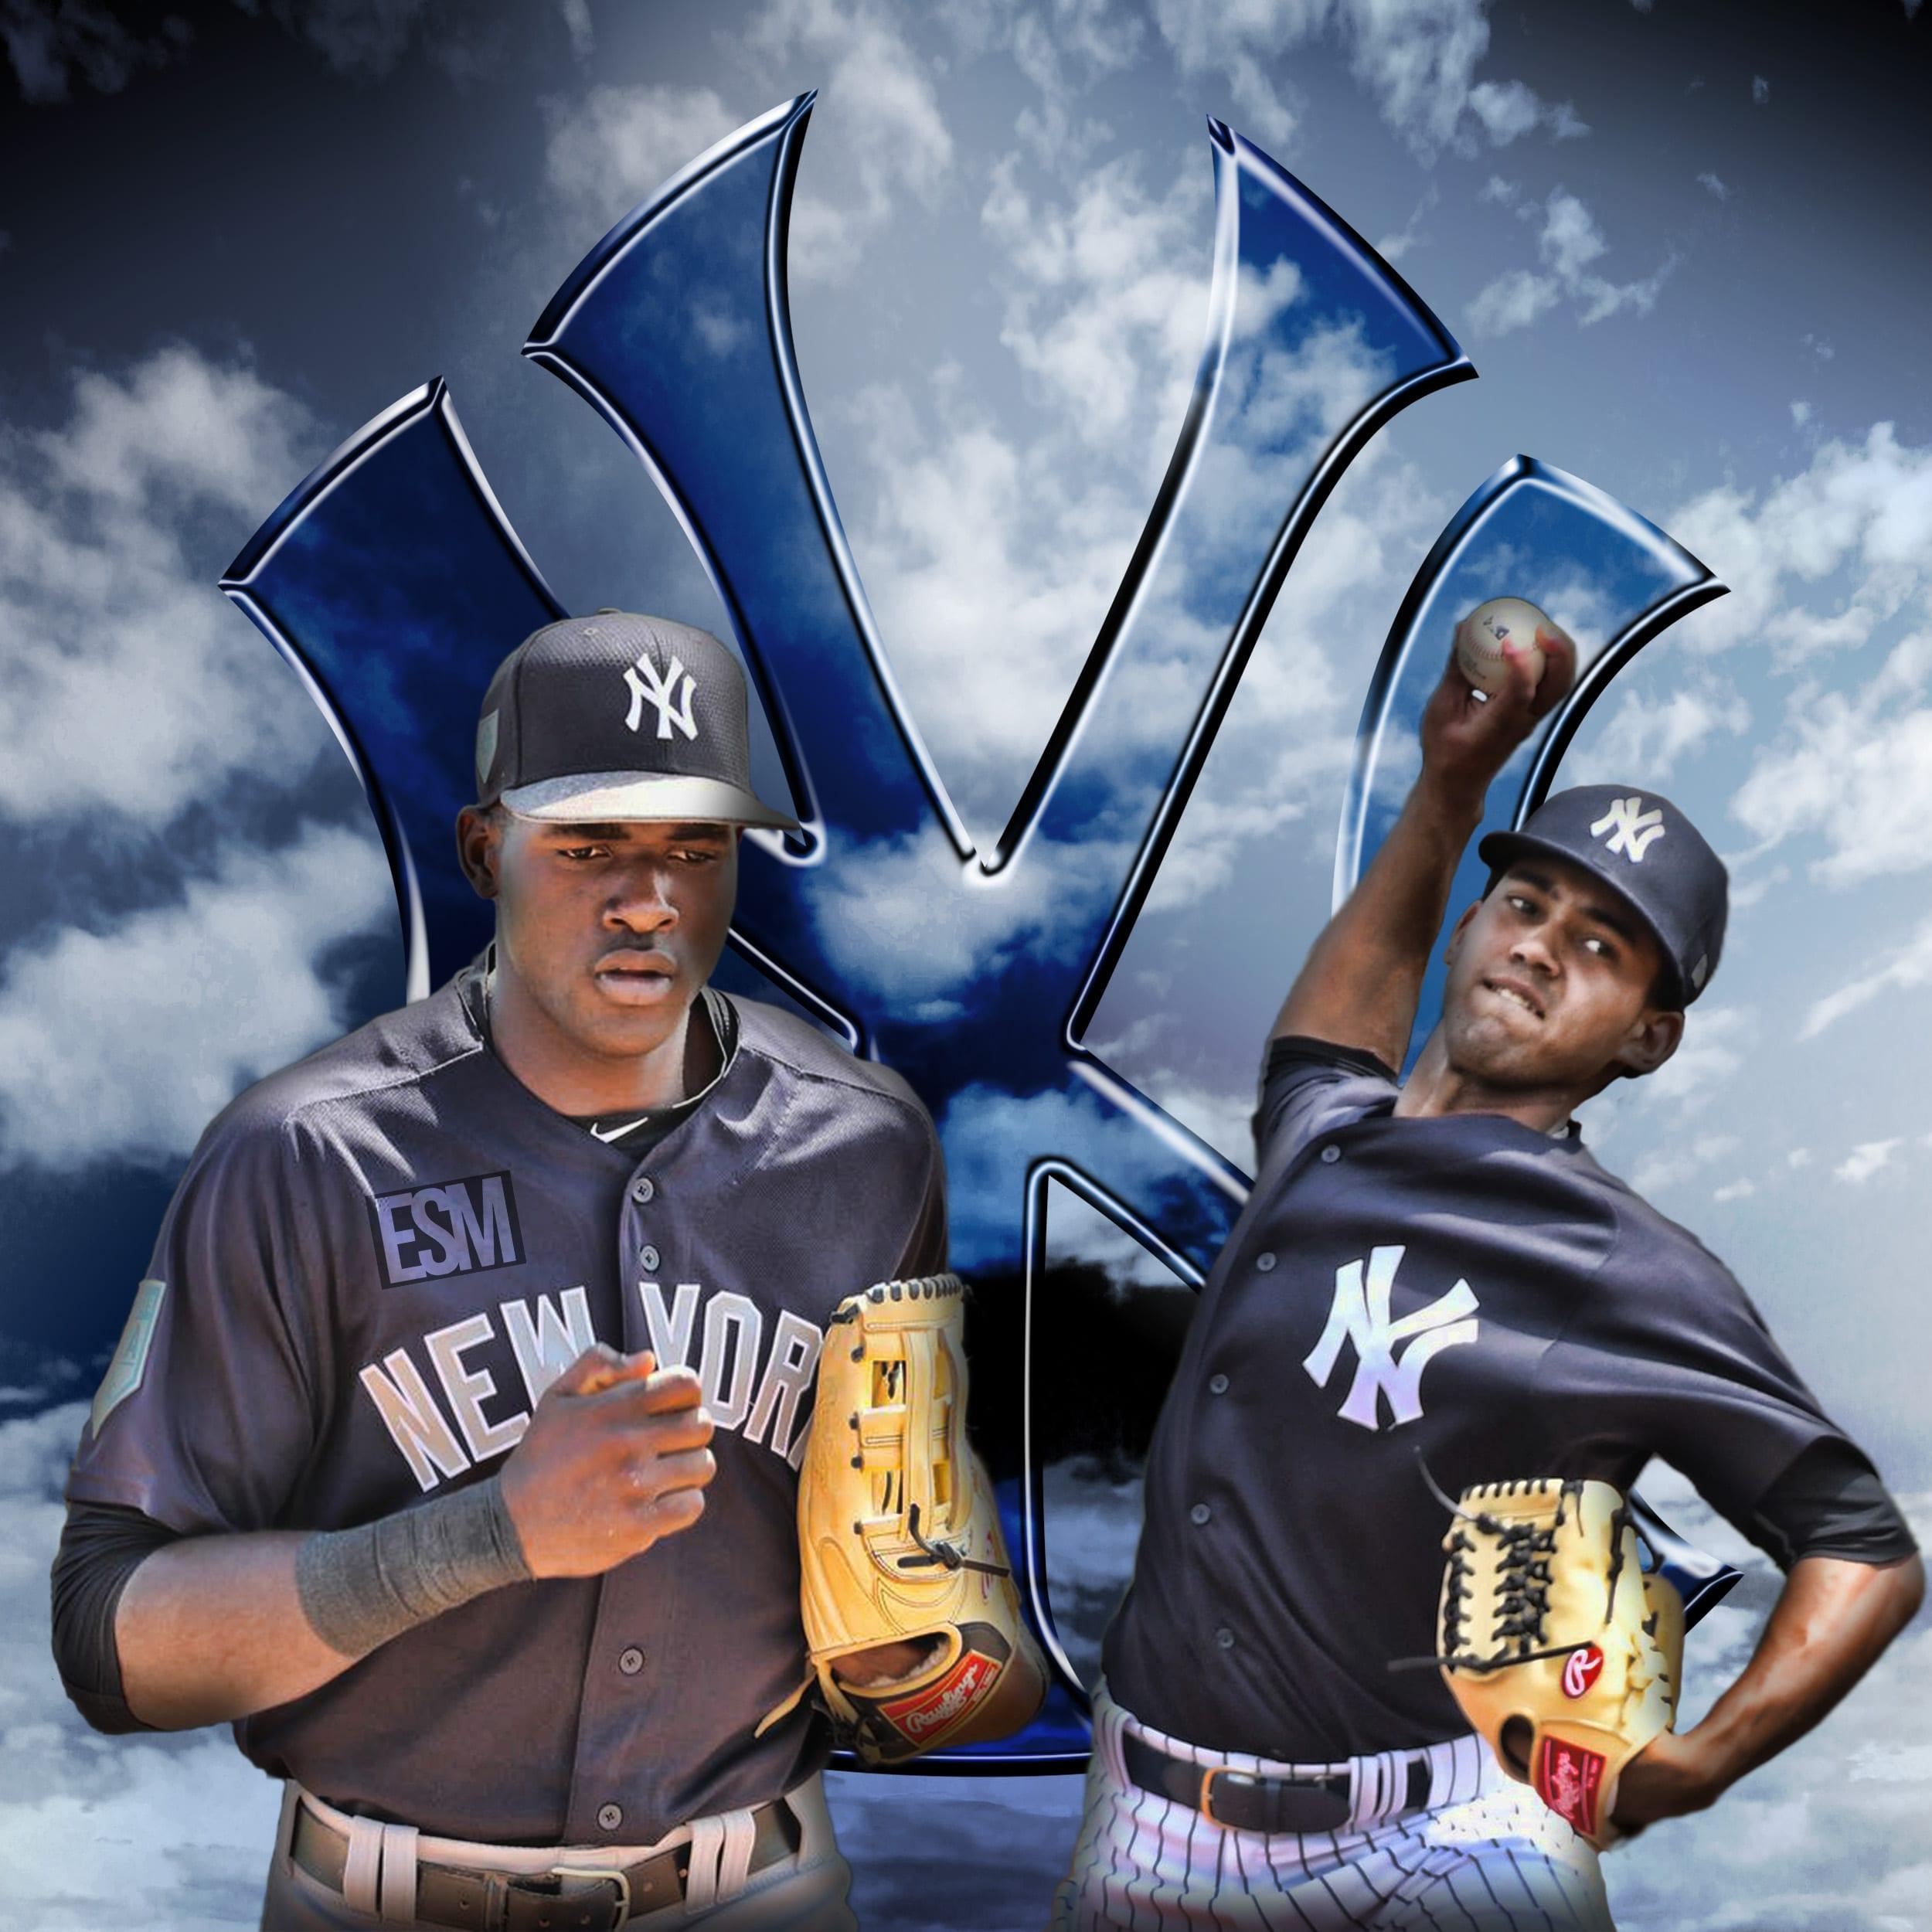 New York Yankees, Deivi Garcia, Estevan Florial